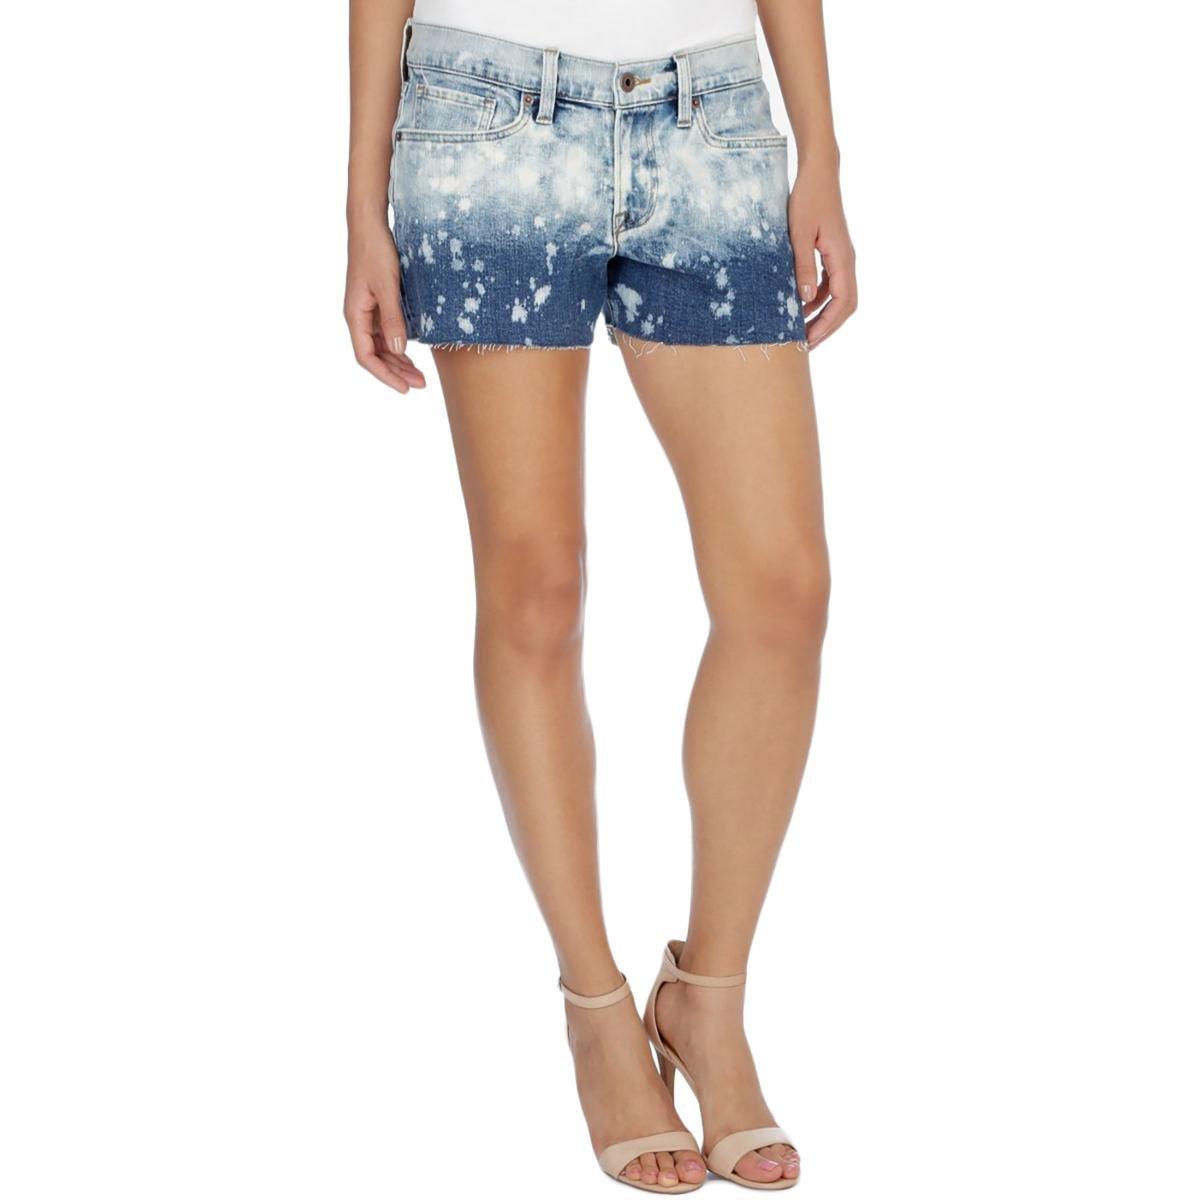 Lucky Brand Women's The Cutoff Jean Short, Santa Barbara, 29